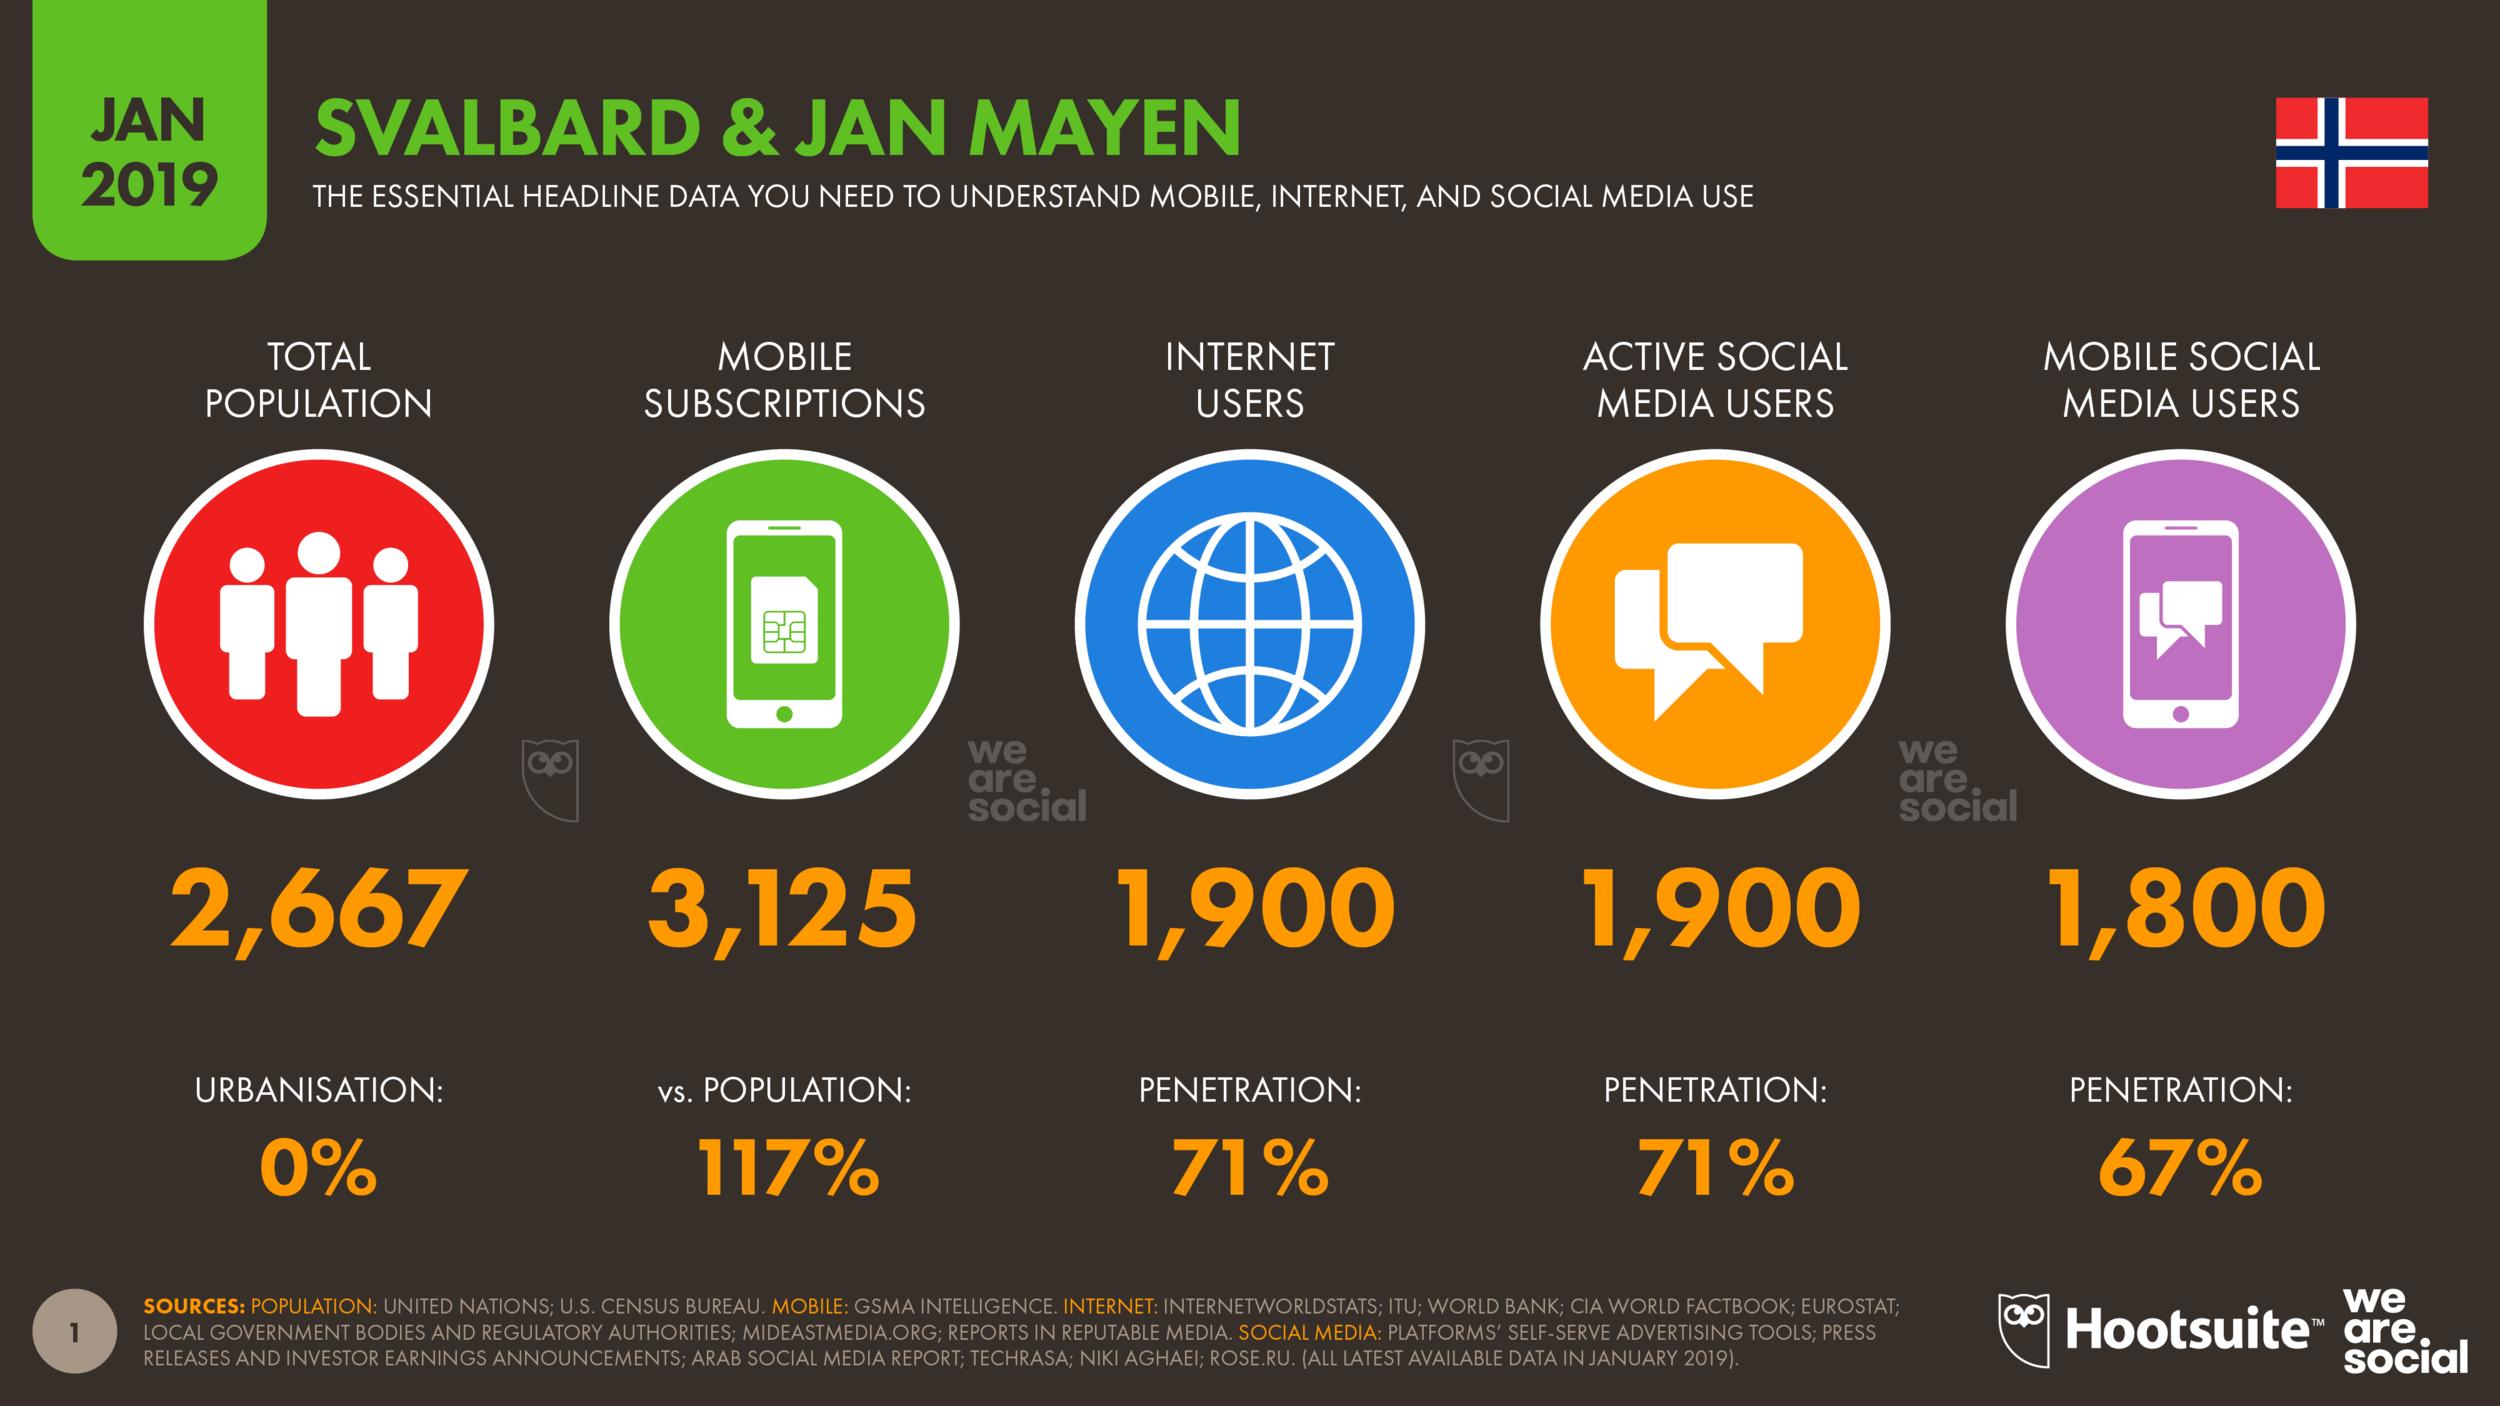 Digital 2019 Svalbard & Jan Mayen January 2019 DataReportal